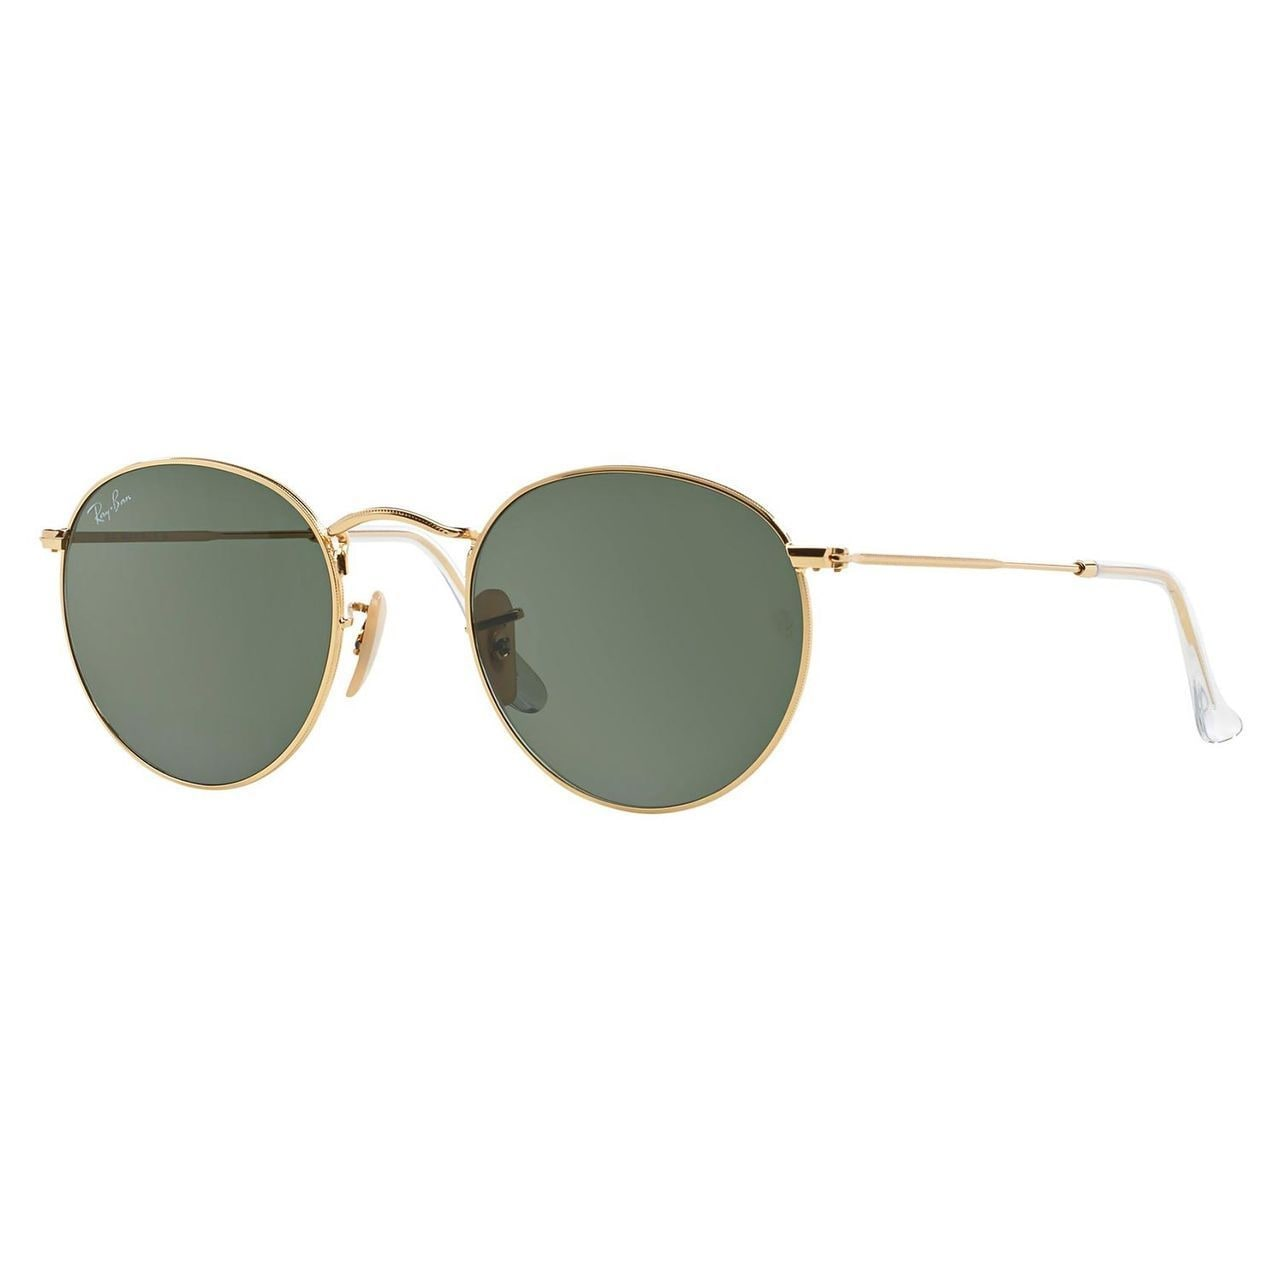 b3c705c41086 Ray-Ban Round Metal RB3447 Unisex Gold Frame Green Classic Lens Sunglasses